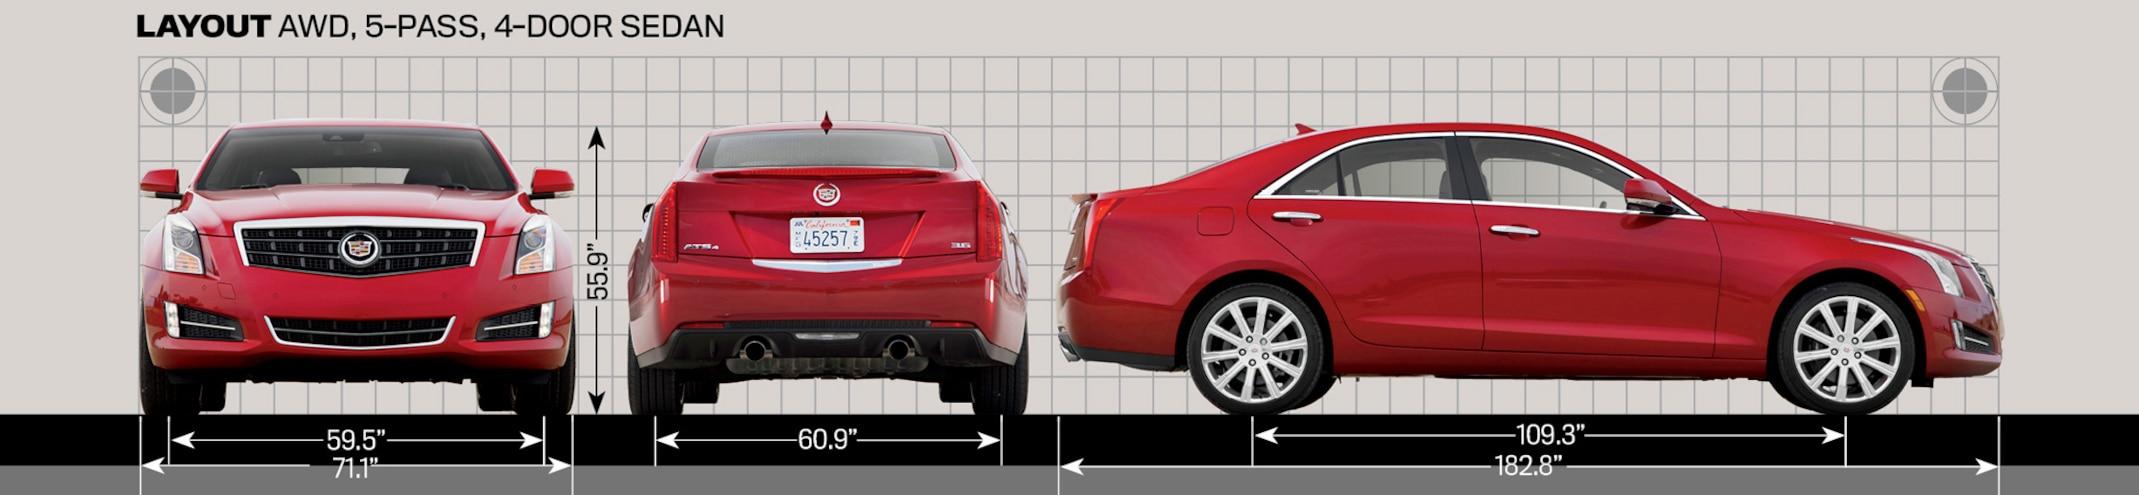 2013 Cadillac ATS4 Dimensions